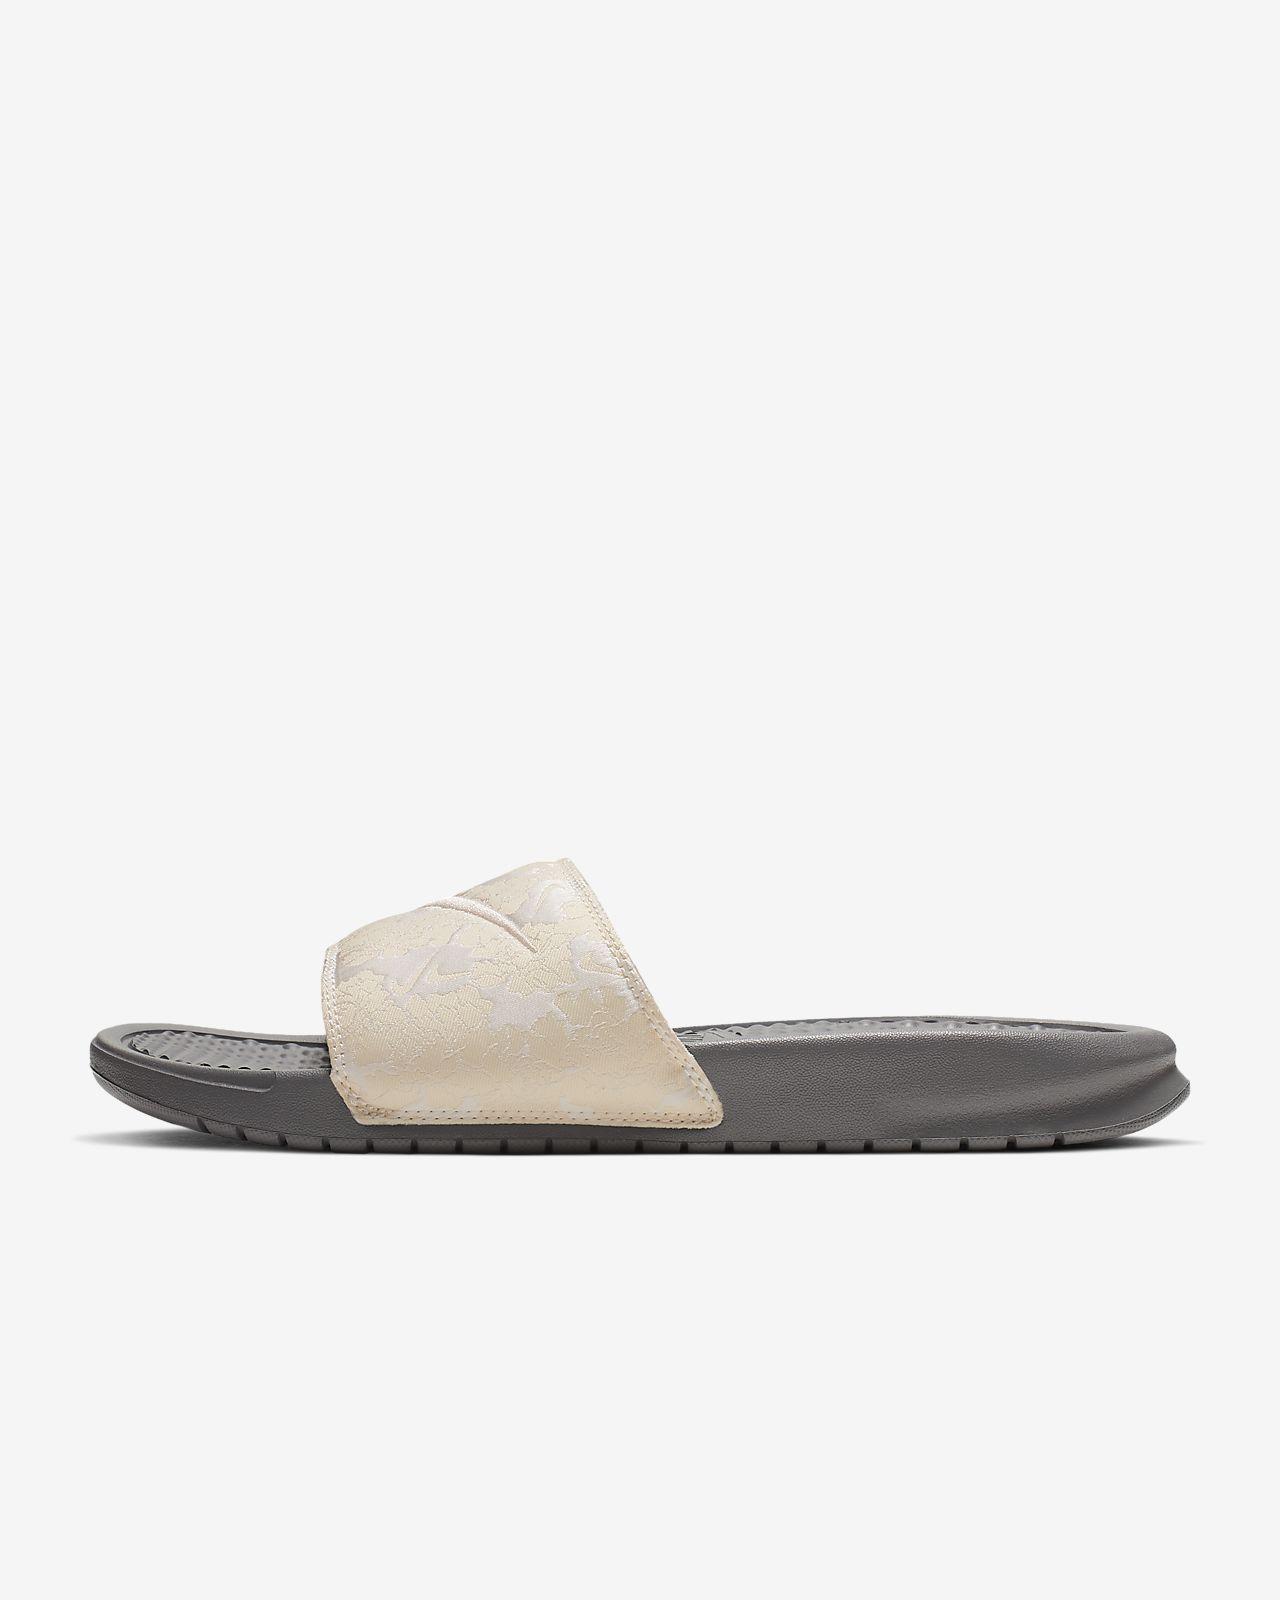 646ee1a9a62 Nike Benassi JDI TXT SE Slipper voor dames. Nike.com BE